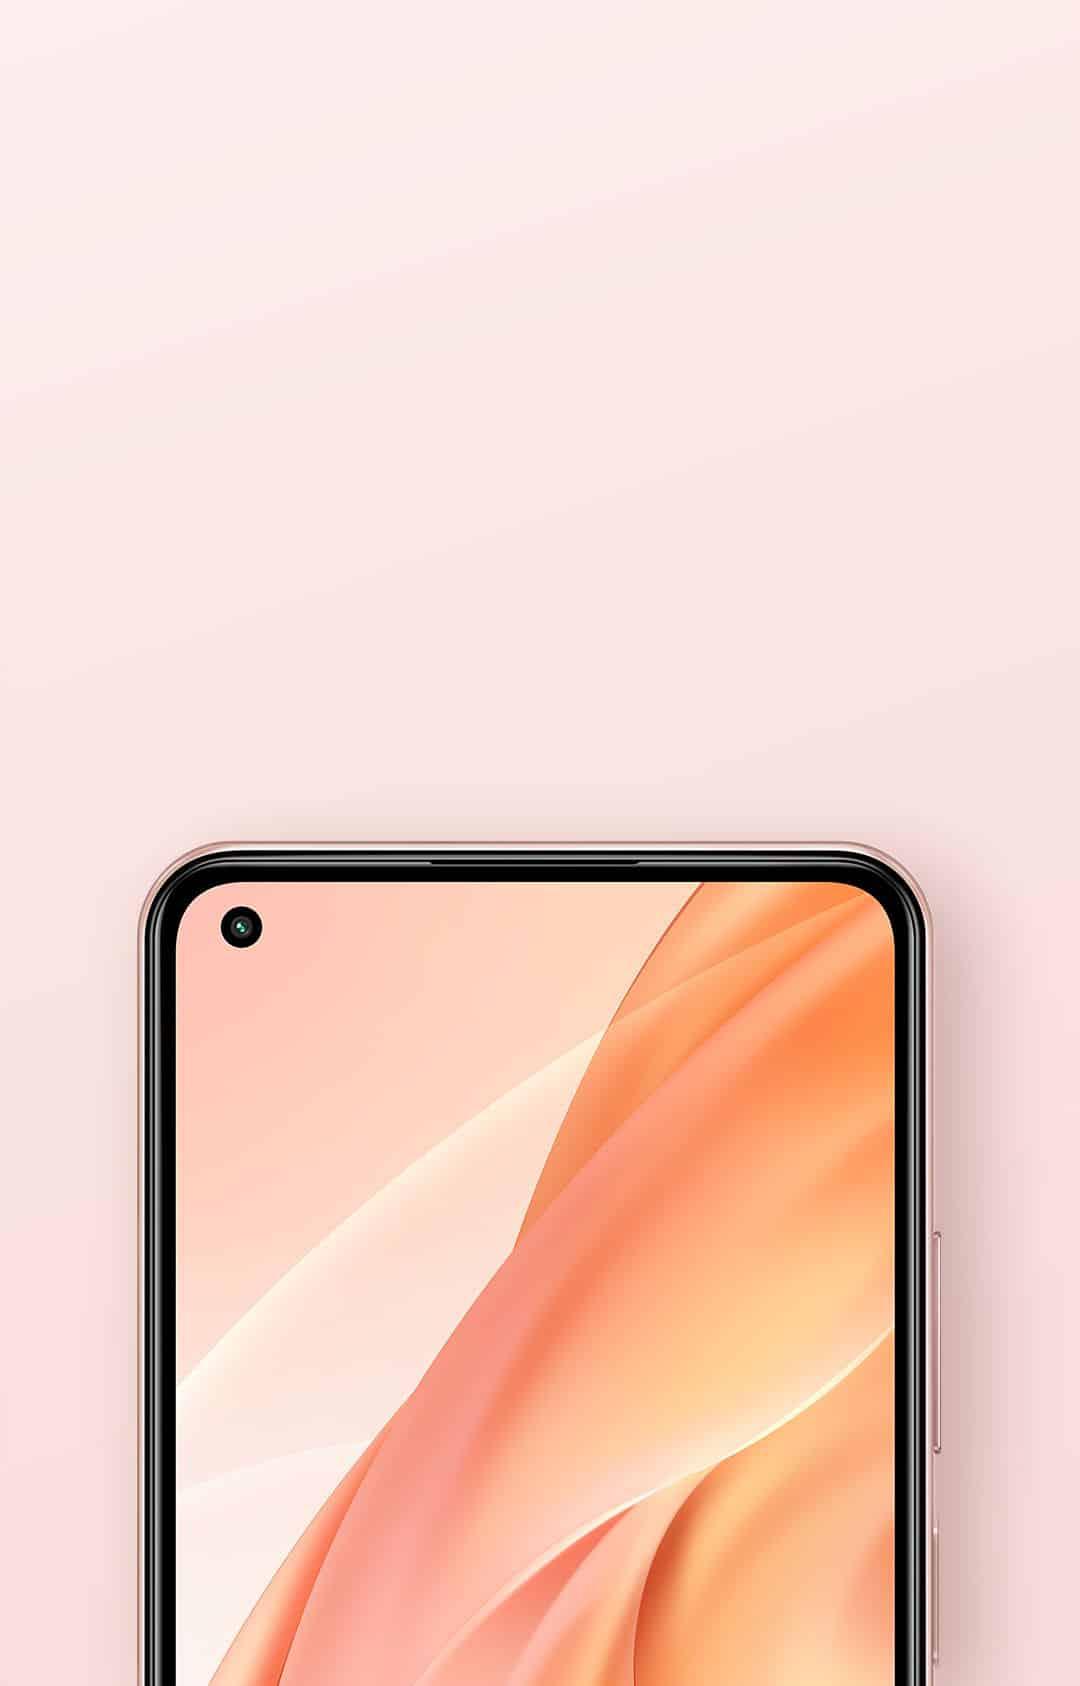 Xiaomi Mi 11 Lite image 5